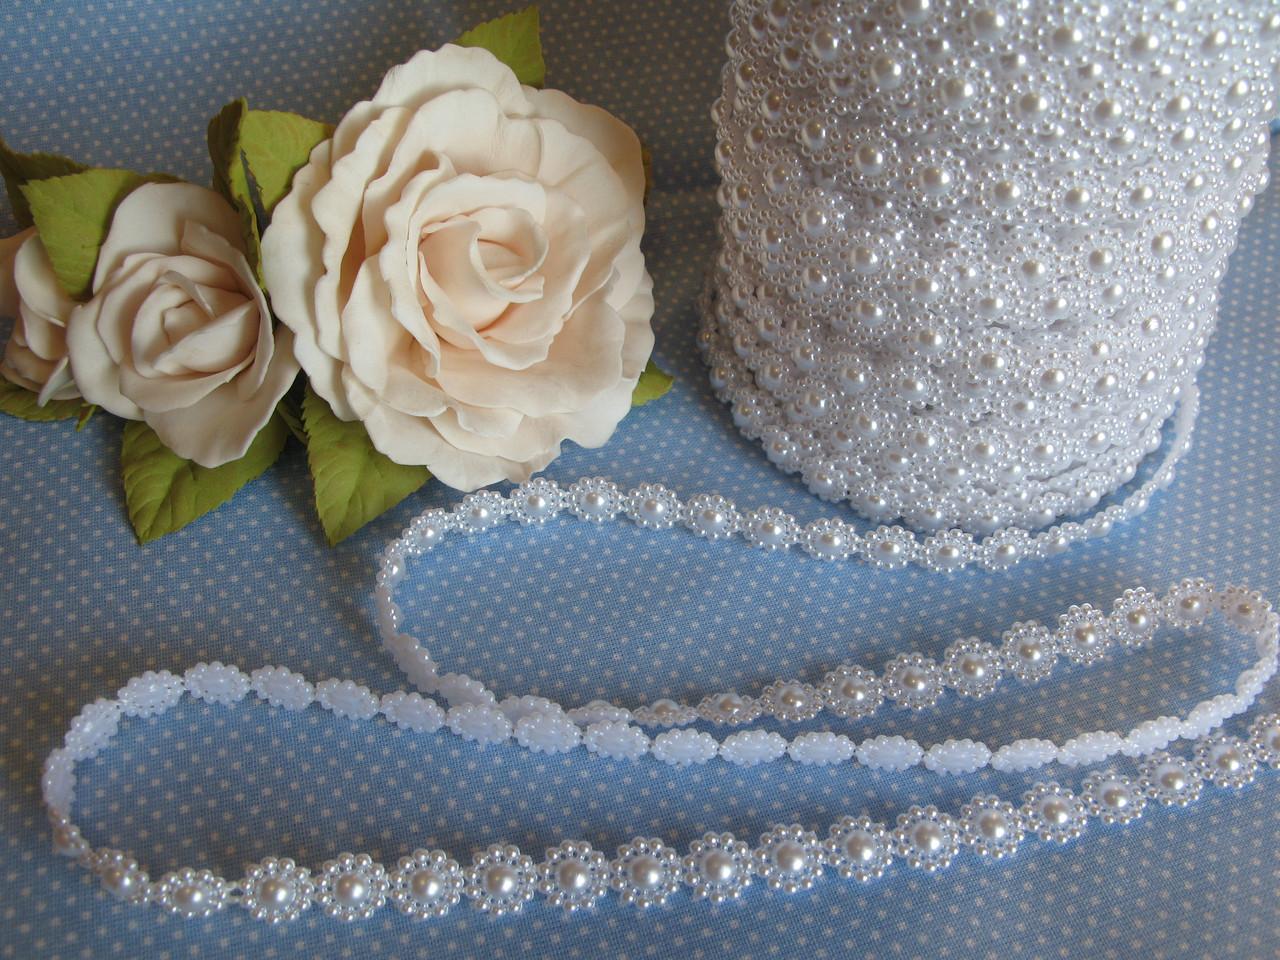 Декоративная лента с полубусинами белая цветок.